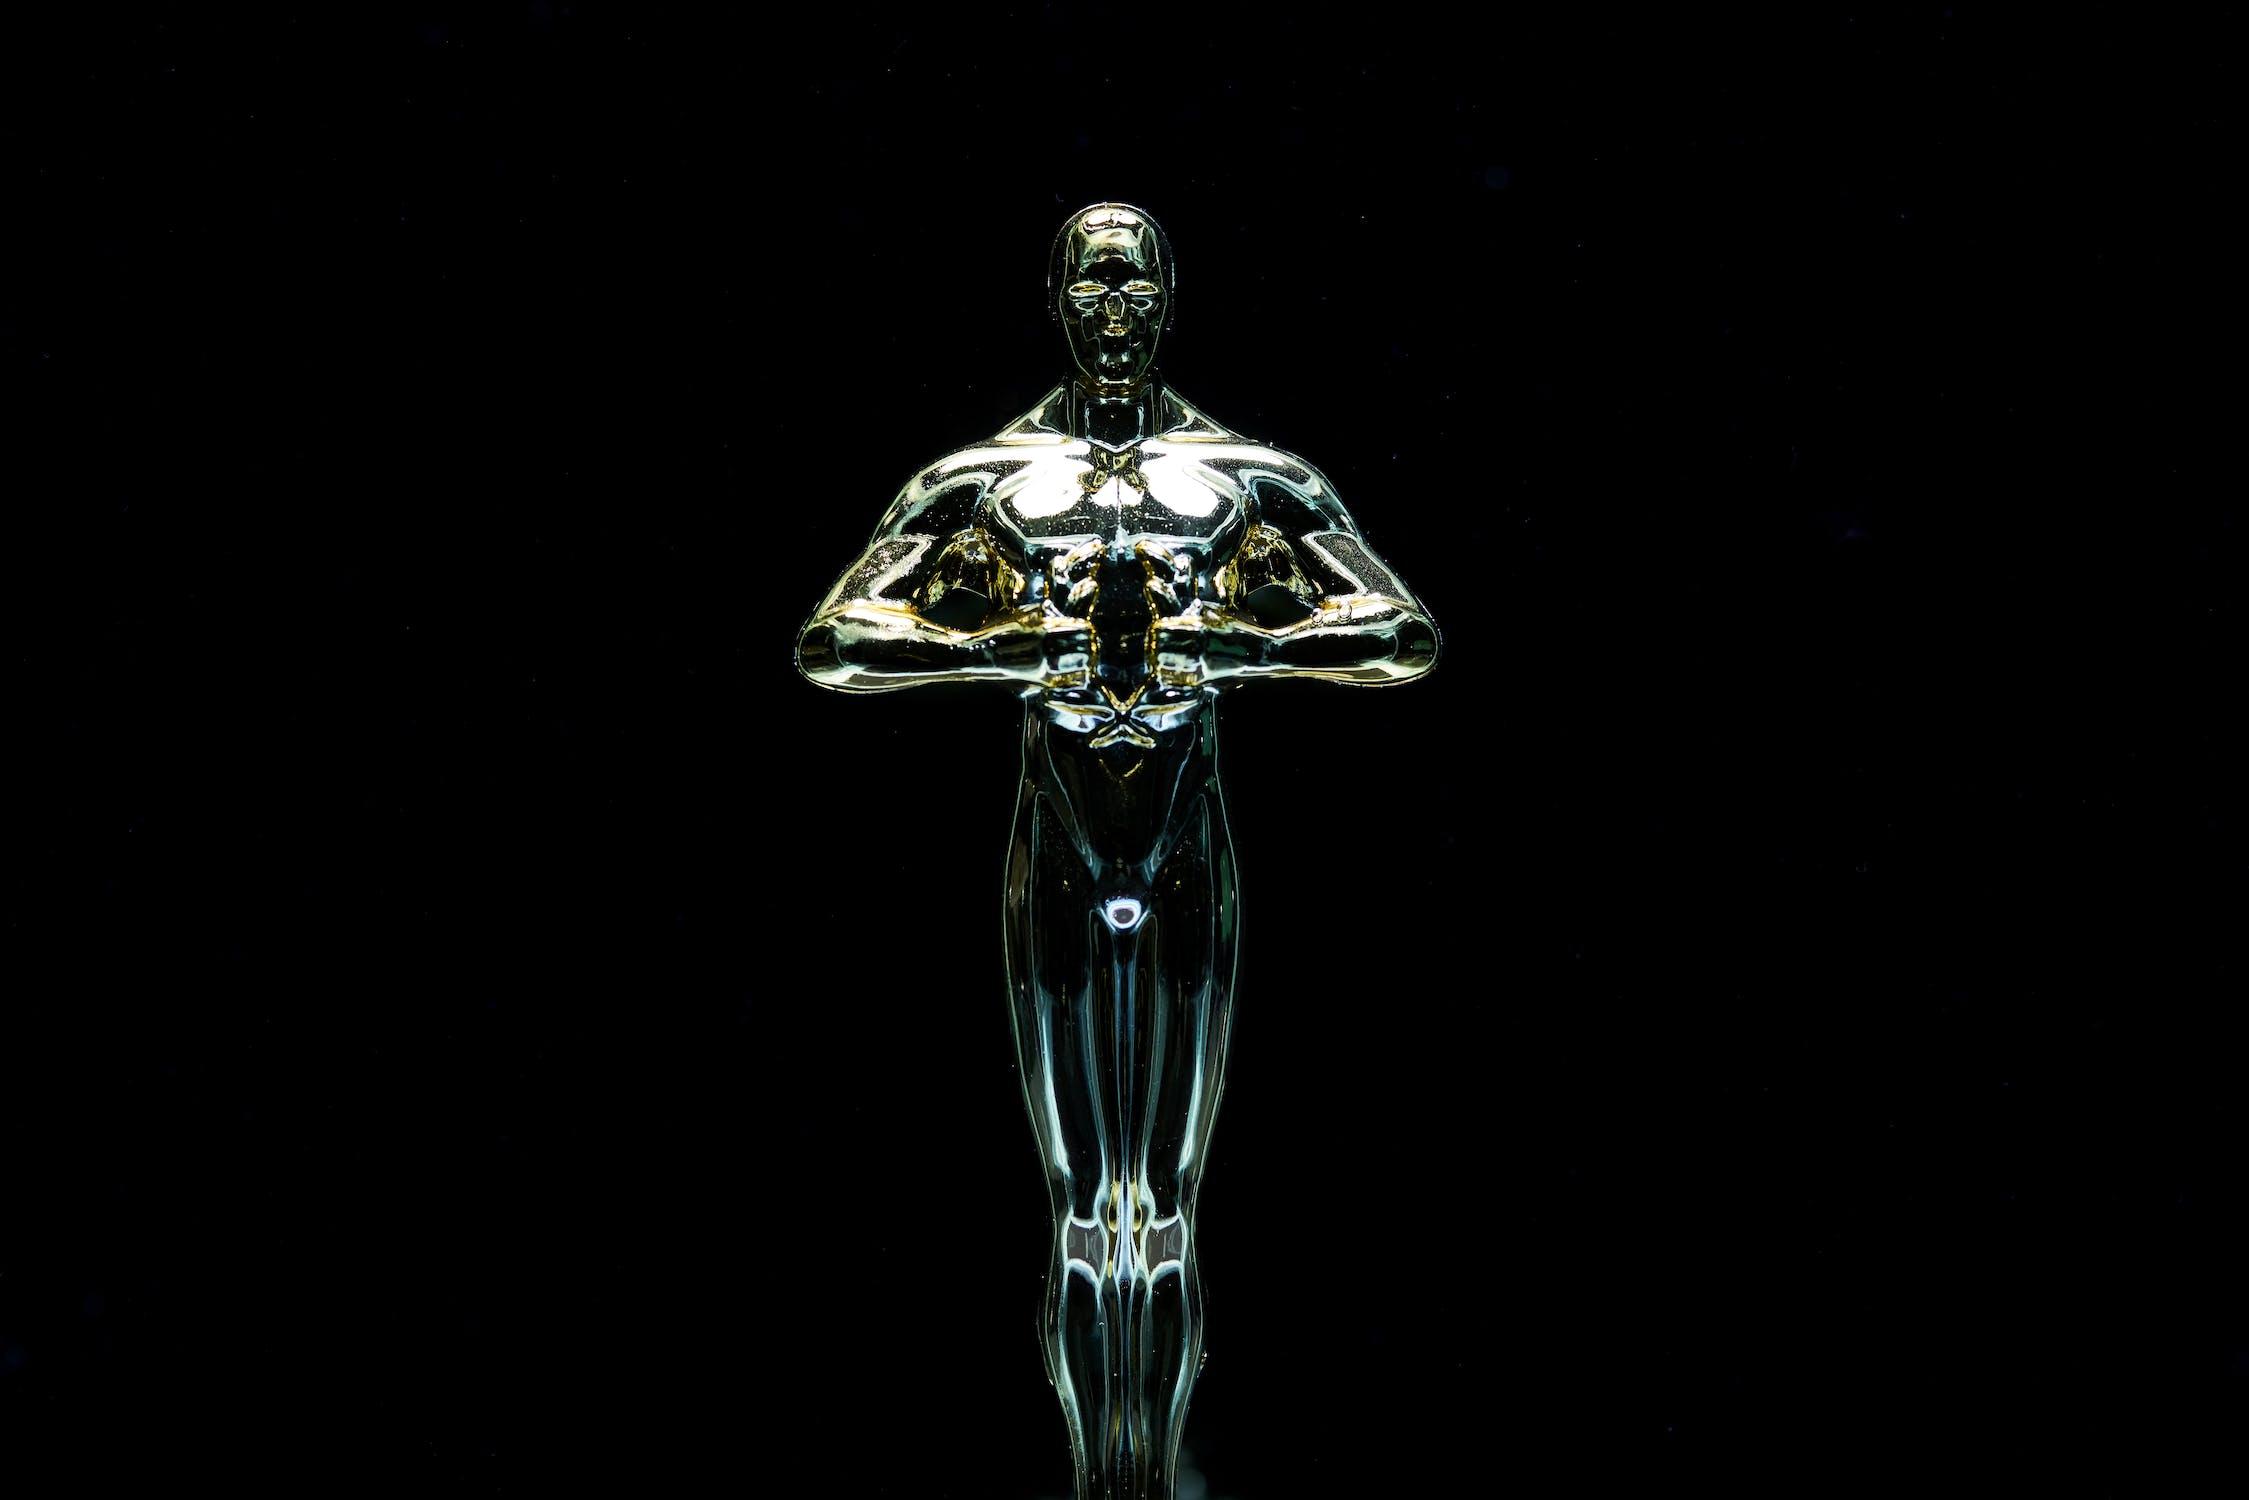 trophy awards hong kong